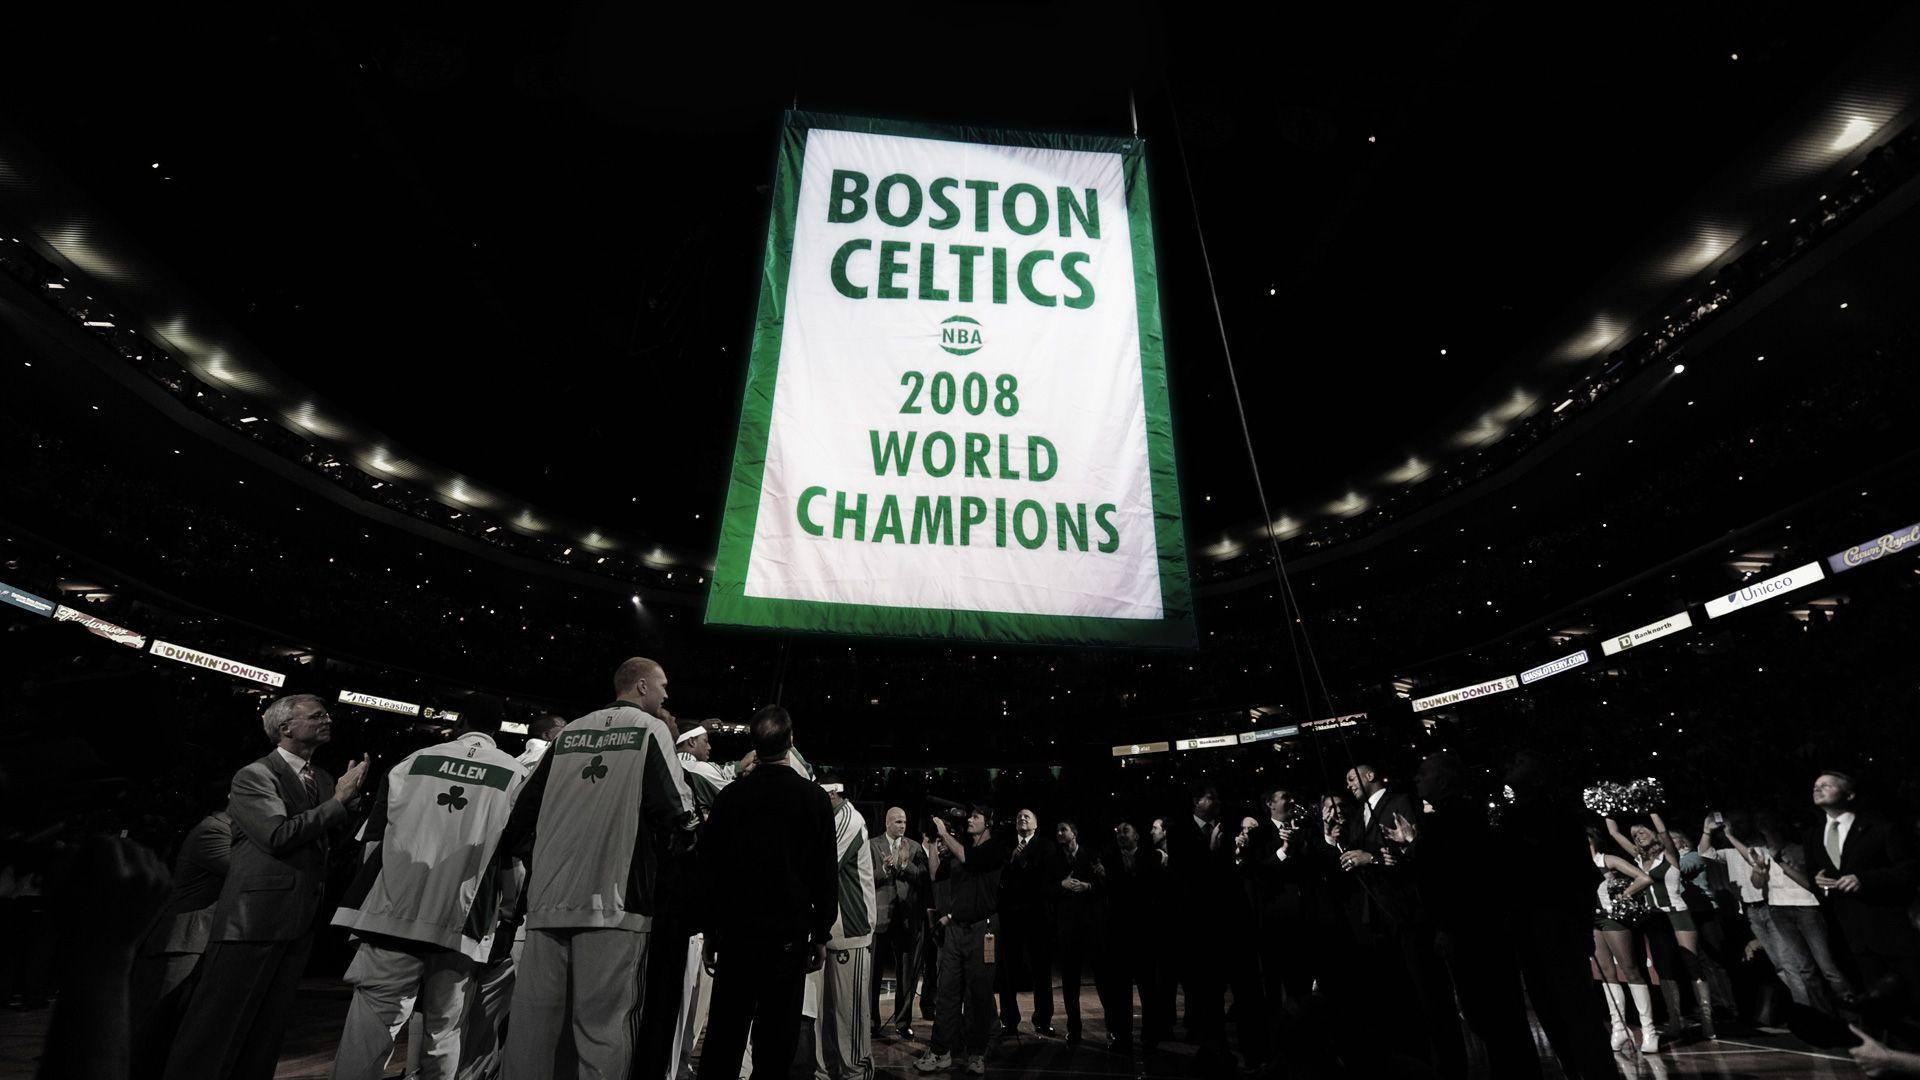 Boston Celtics Boston celtics wallpaper